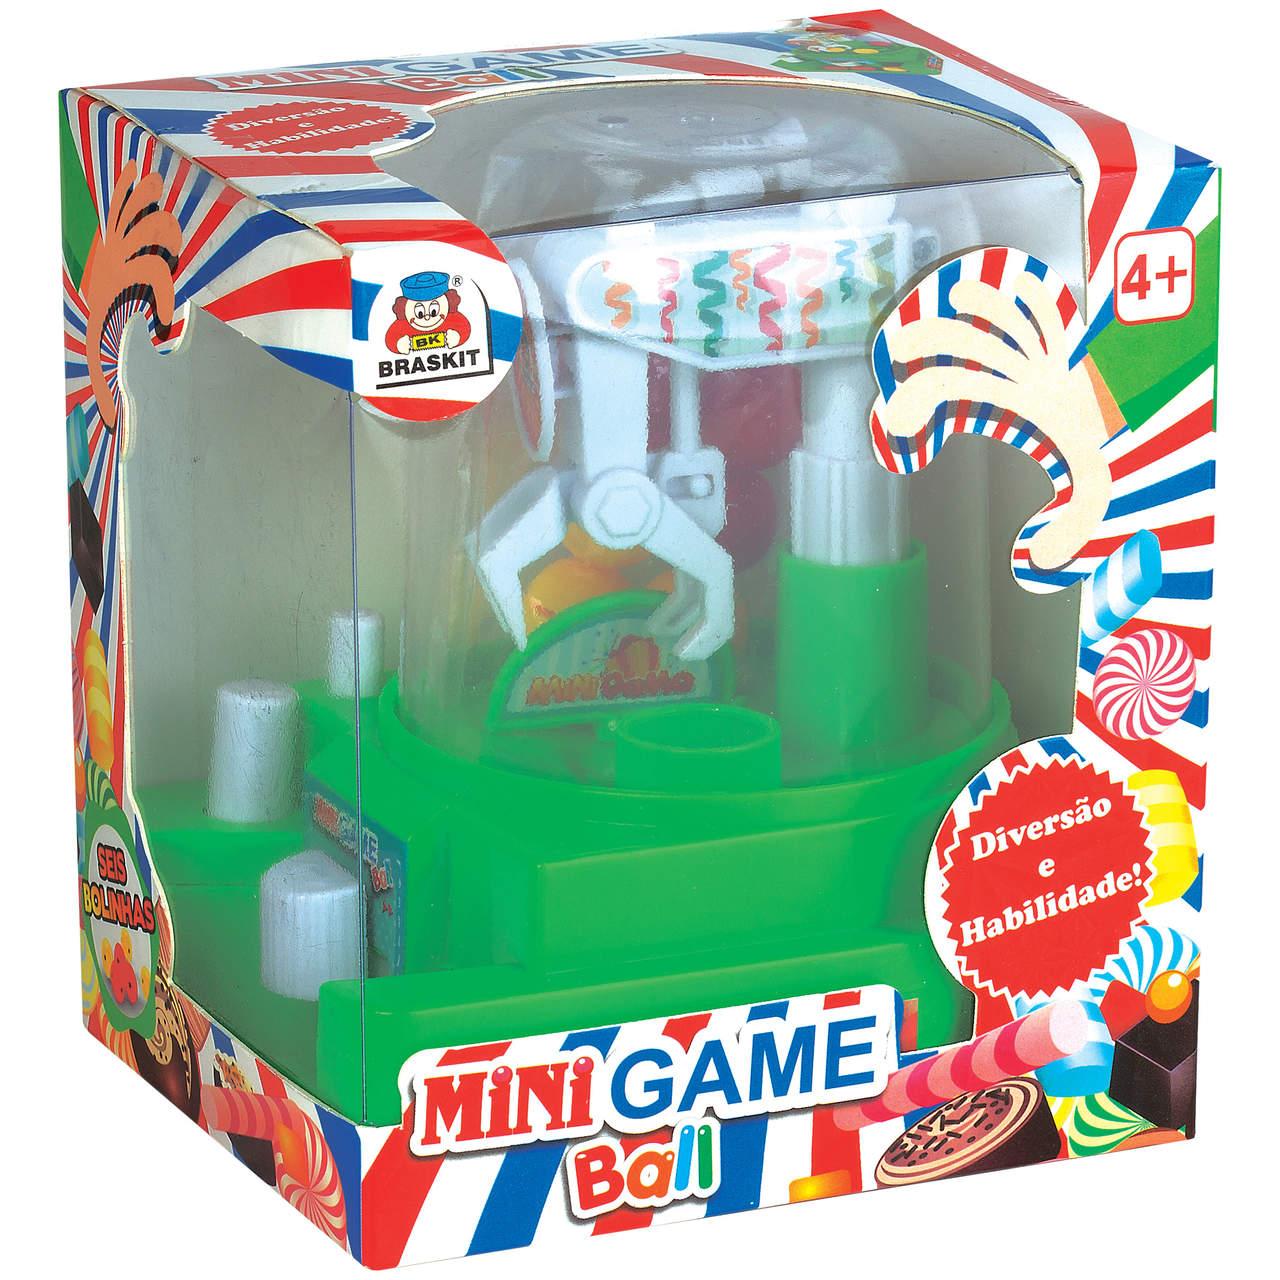 Mini Game Ball Braskit